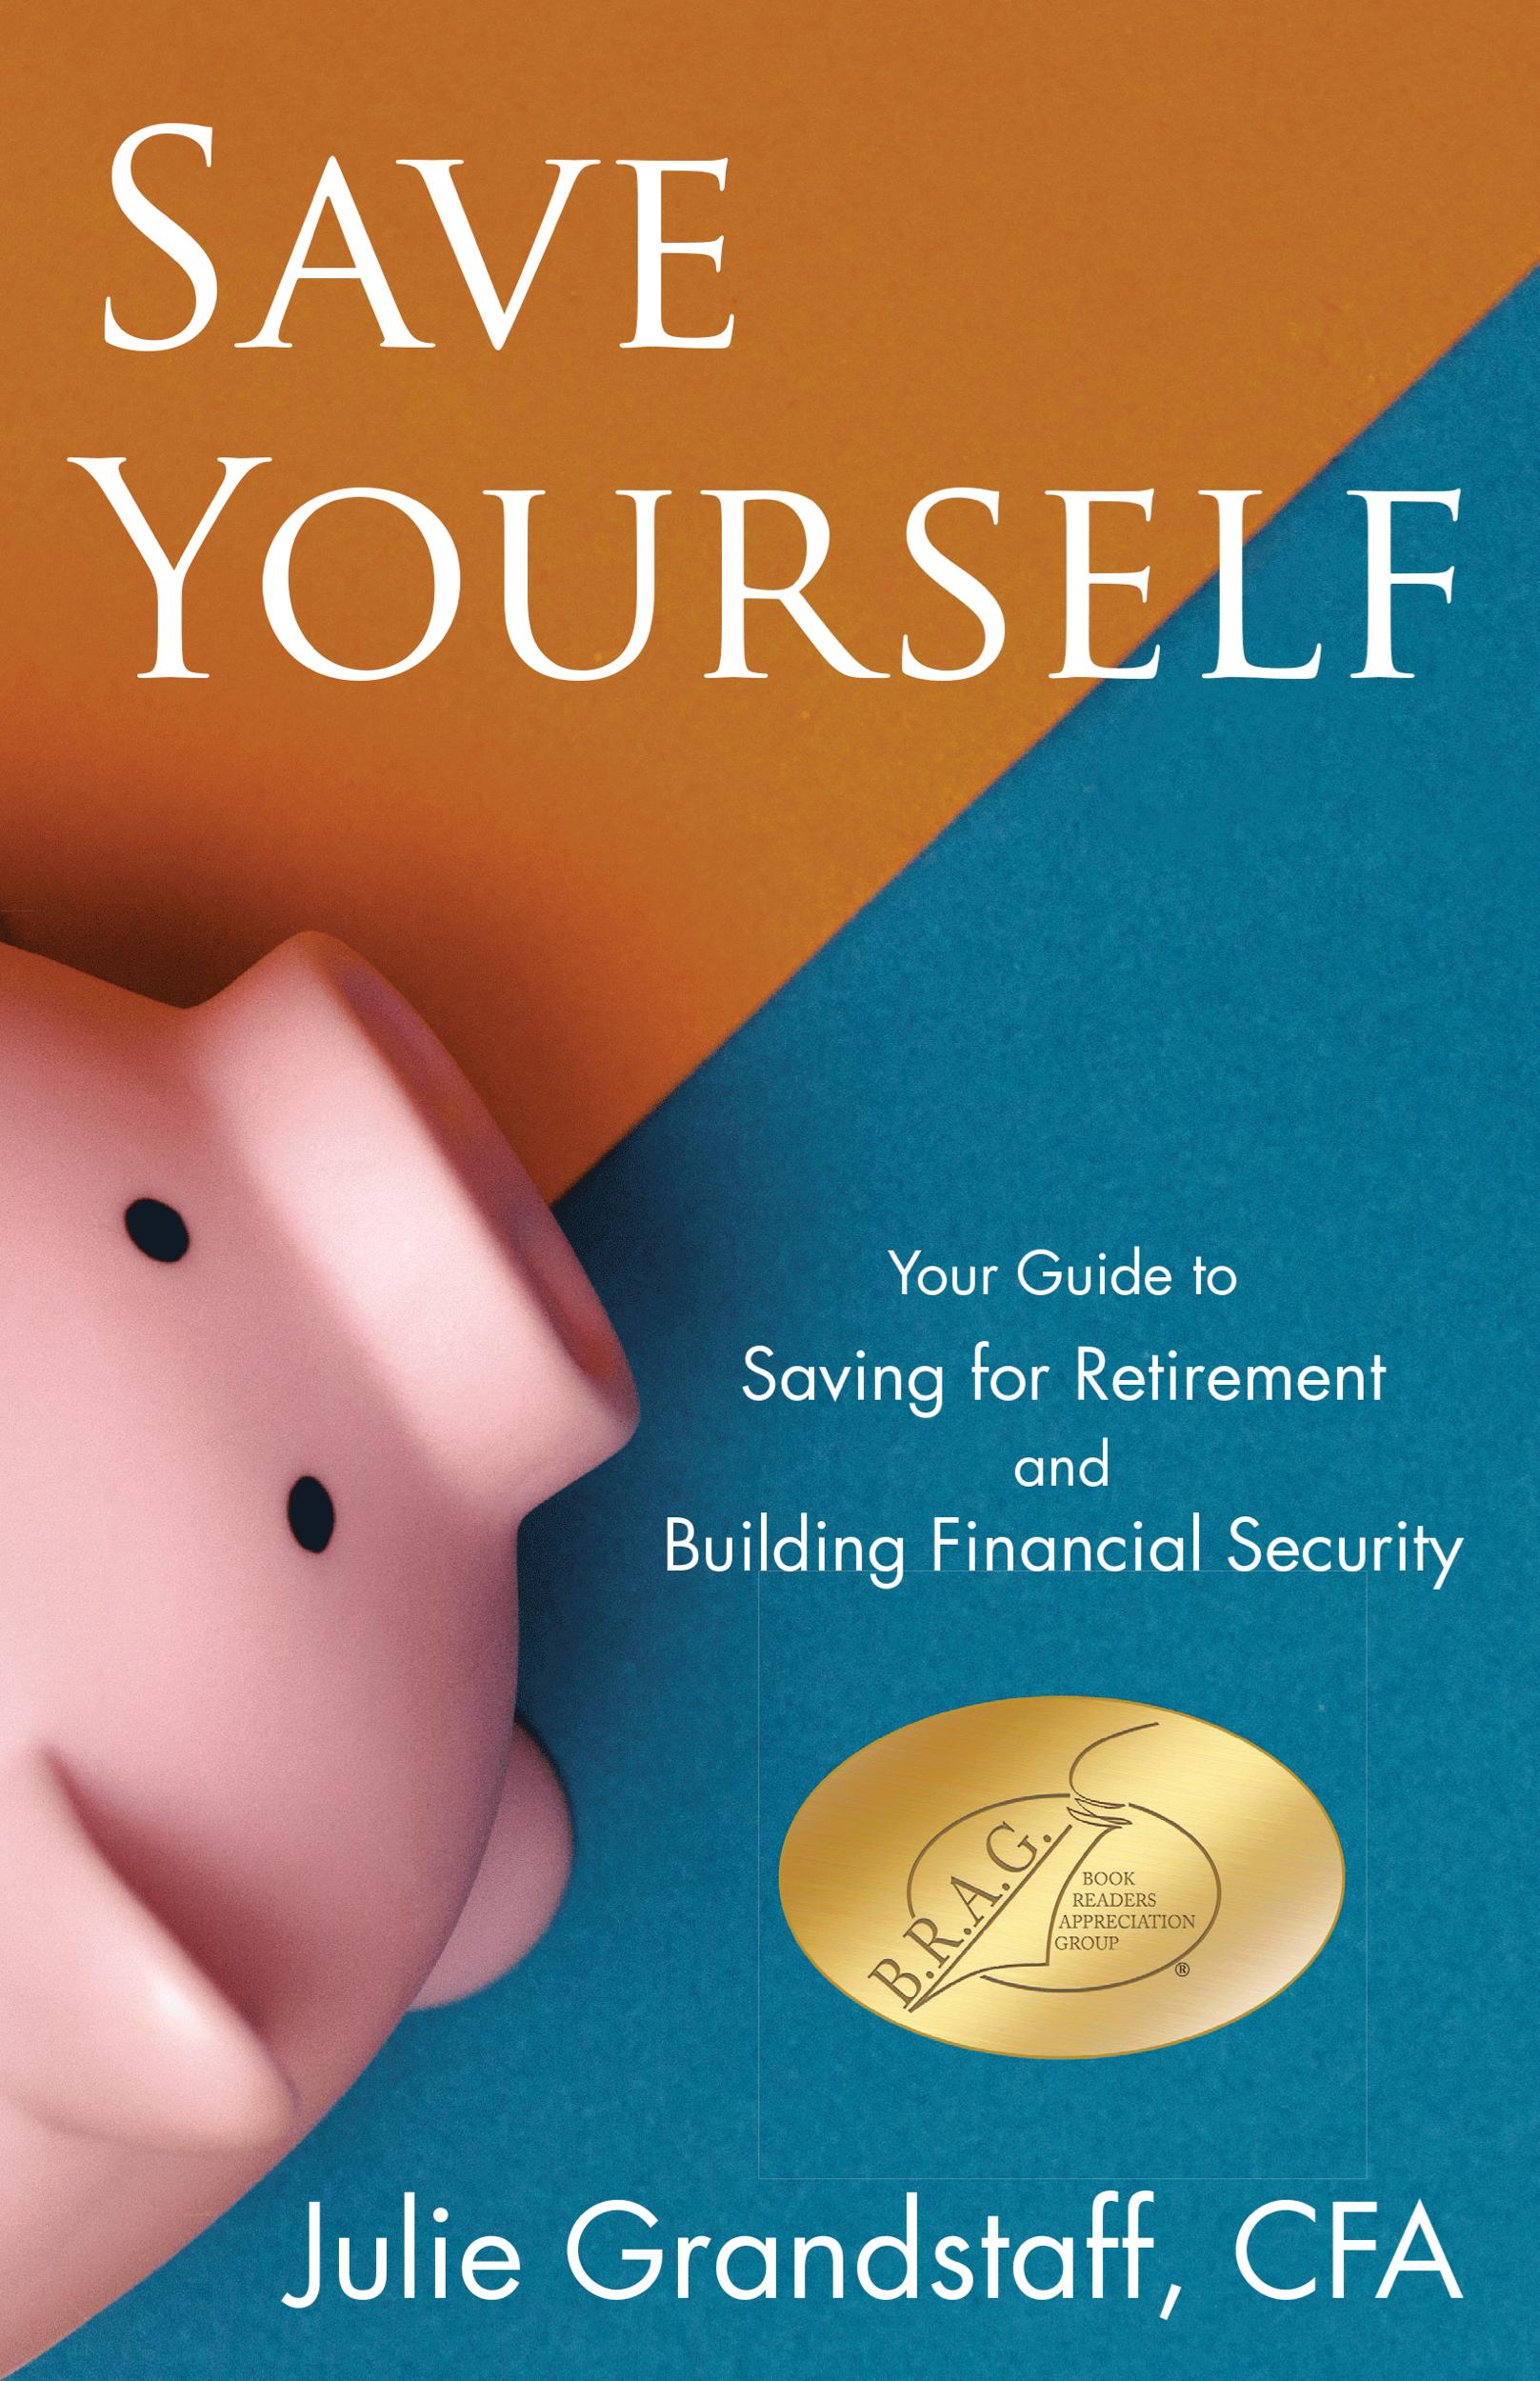 Save Yourself by Julie Grandstaff, CFA (SeSo Press, 2018)